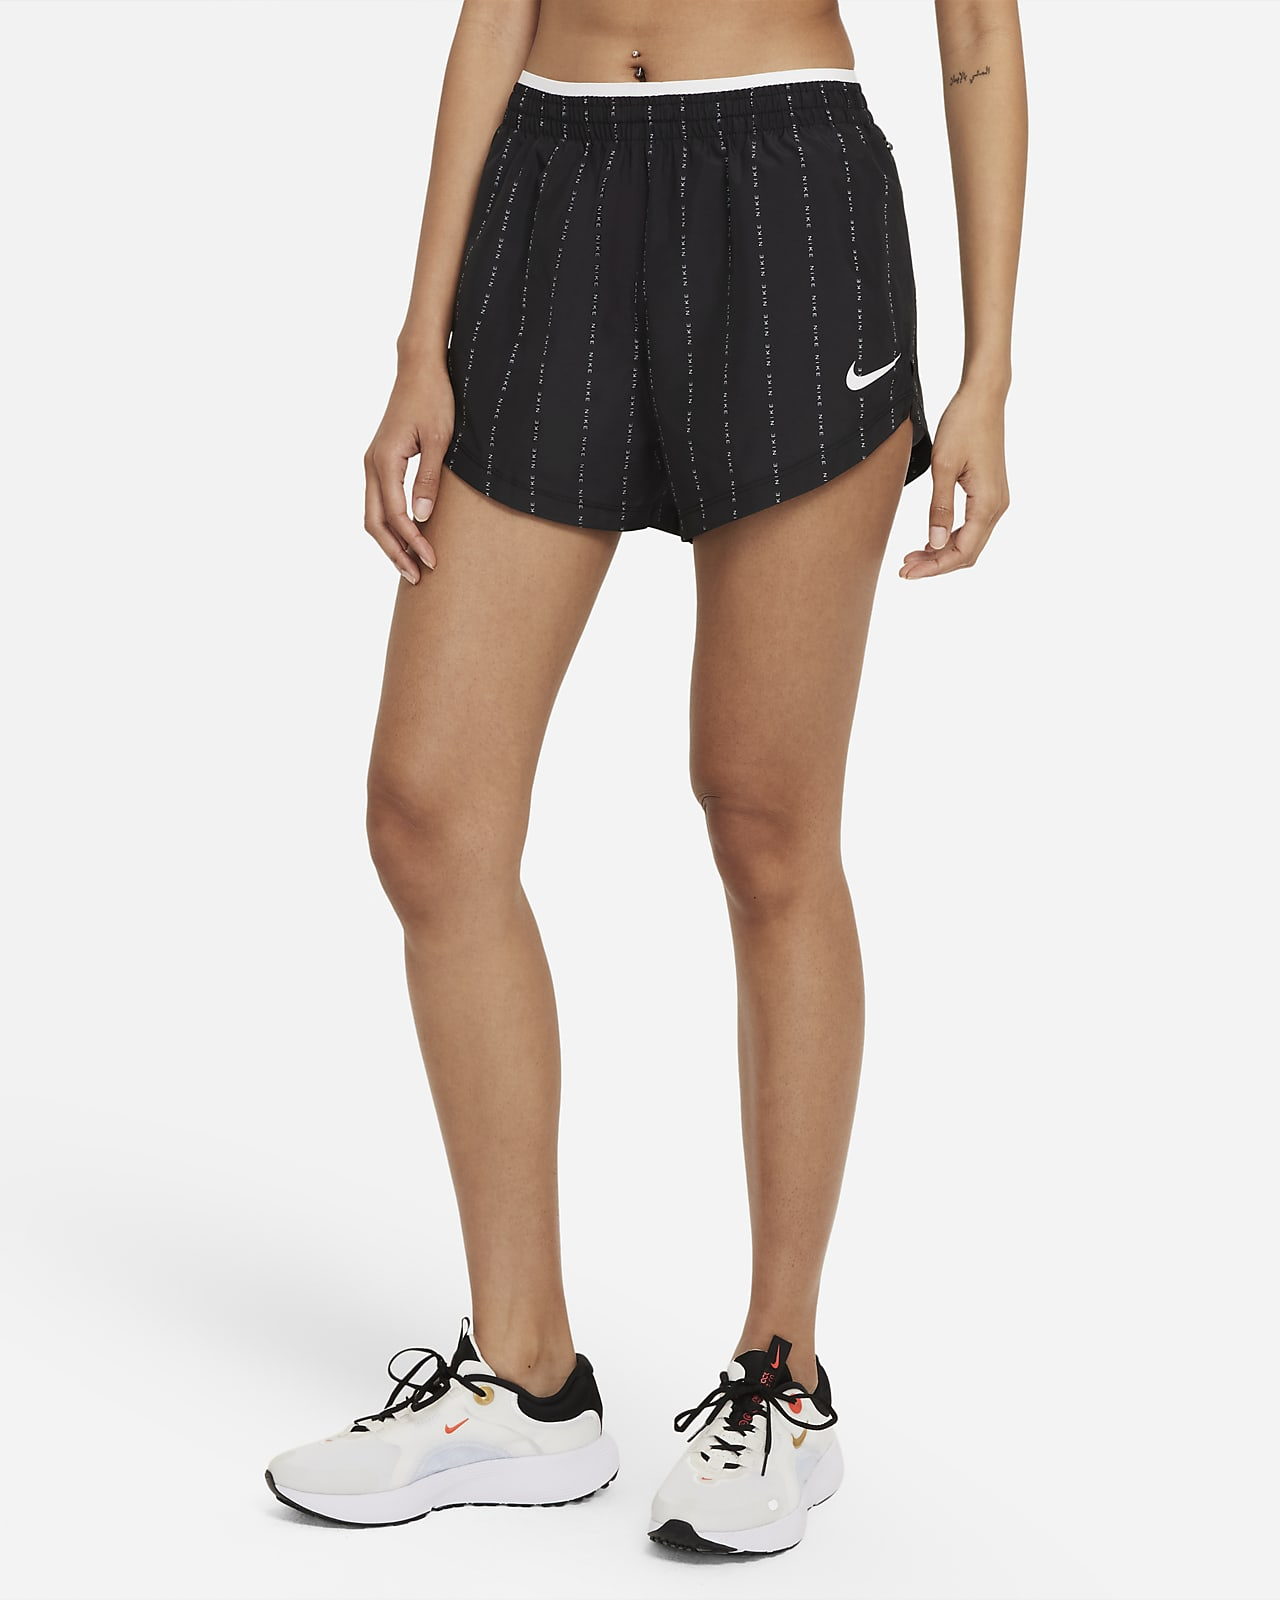 Nike Tempo Luxe Icon Clash női futórövidnadrág